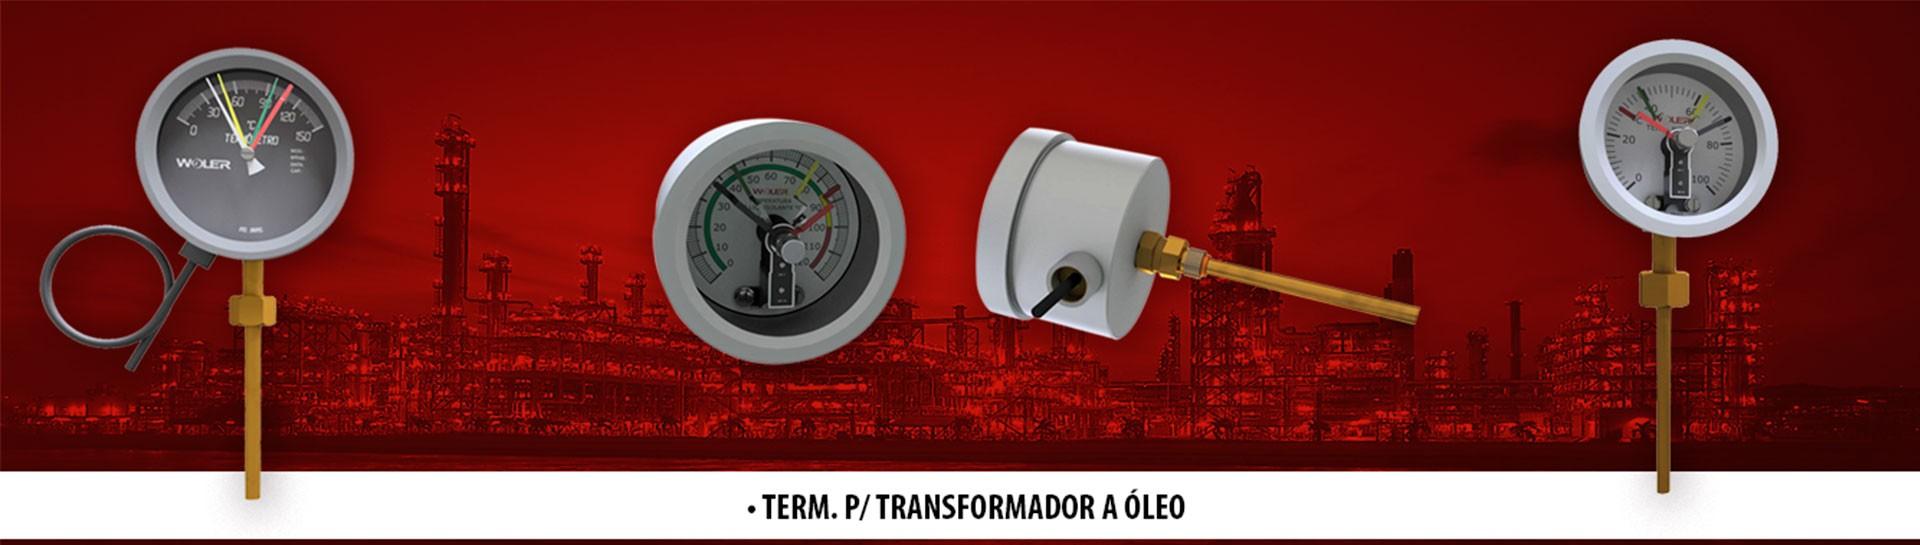 TERMÔMETRO PARA TRANSFORMADORES A ÓLEO